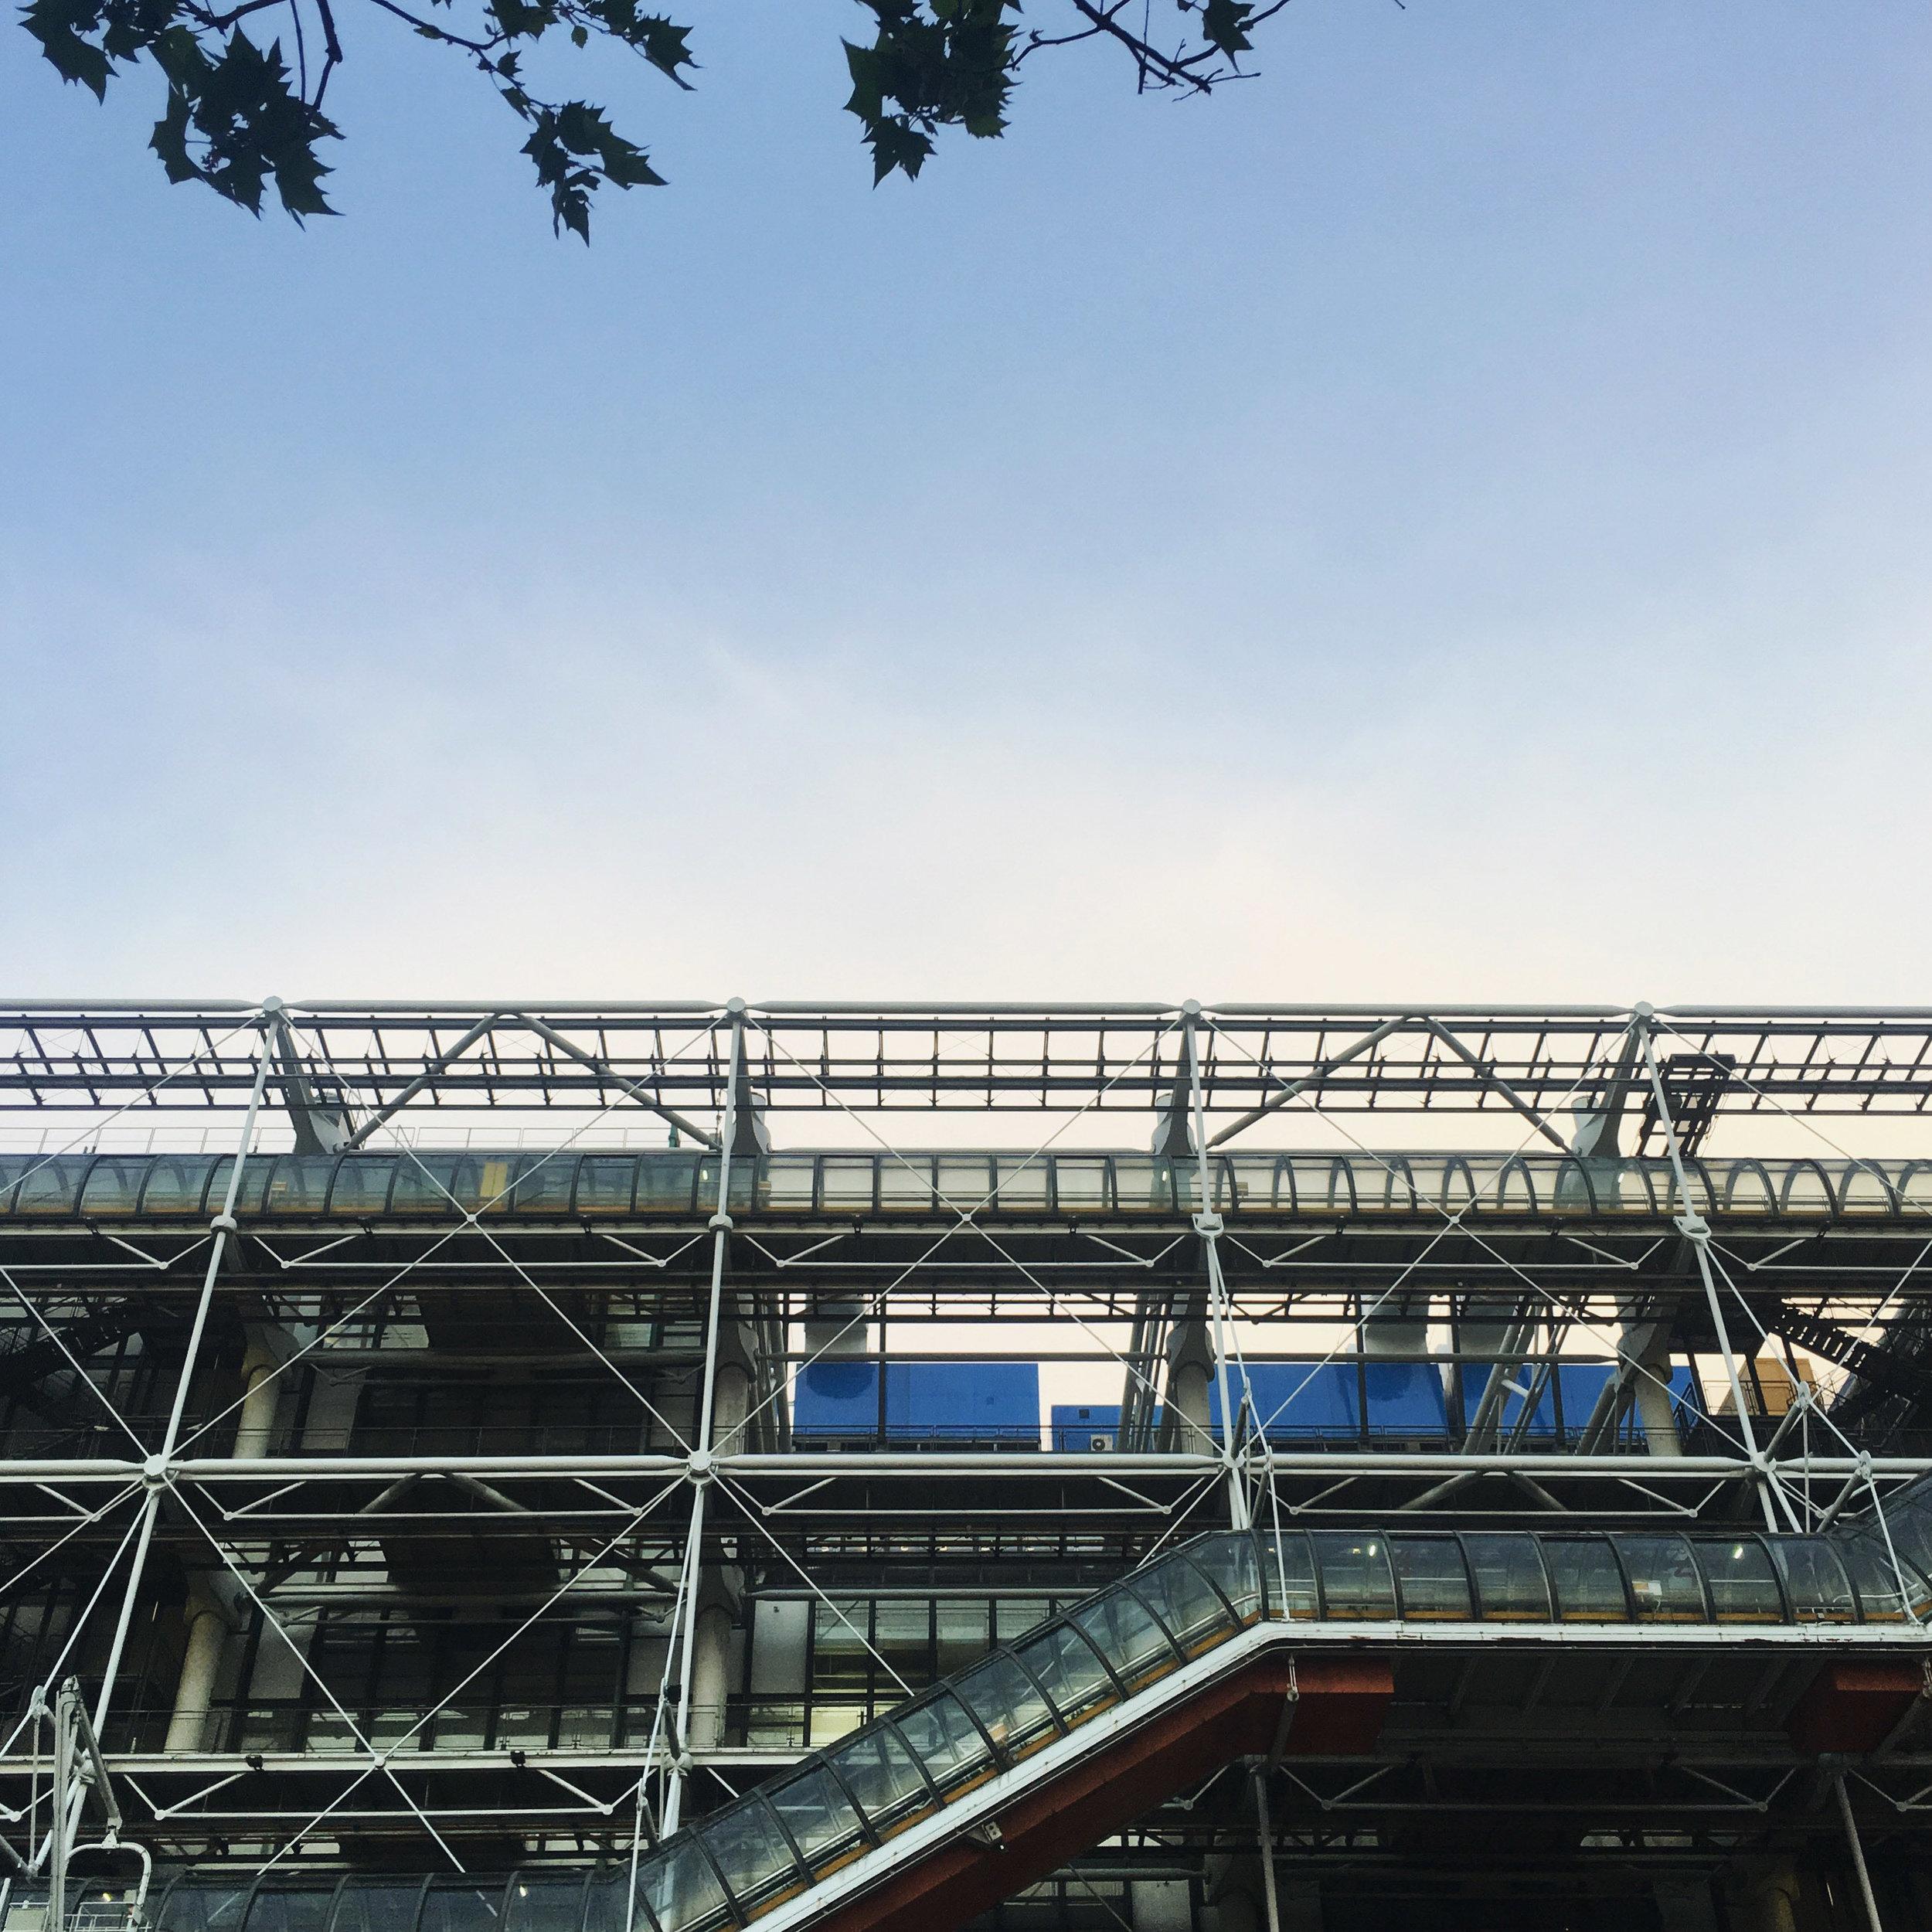 Lozidaze_Pompidou-Centre_01